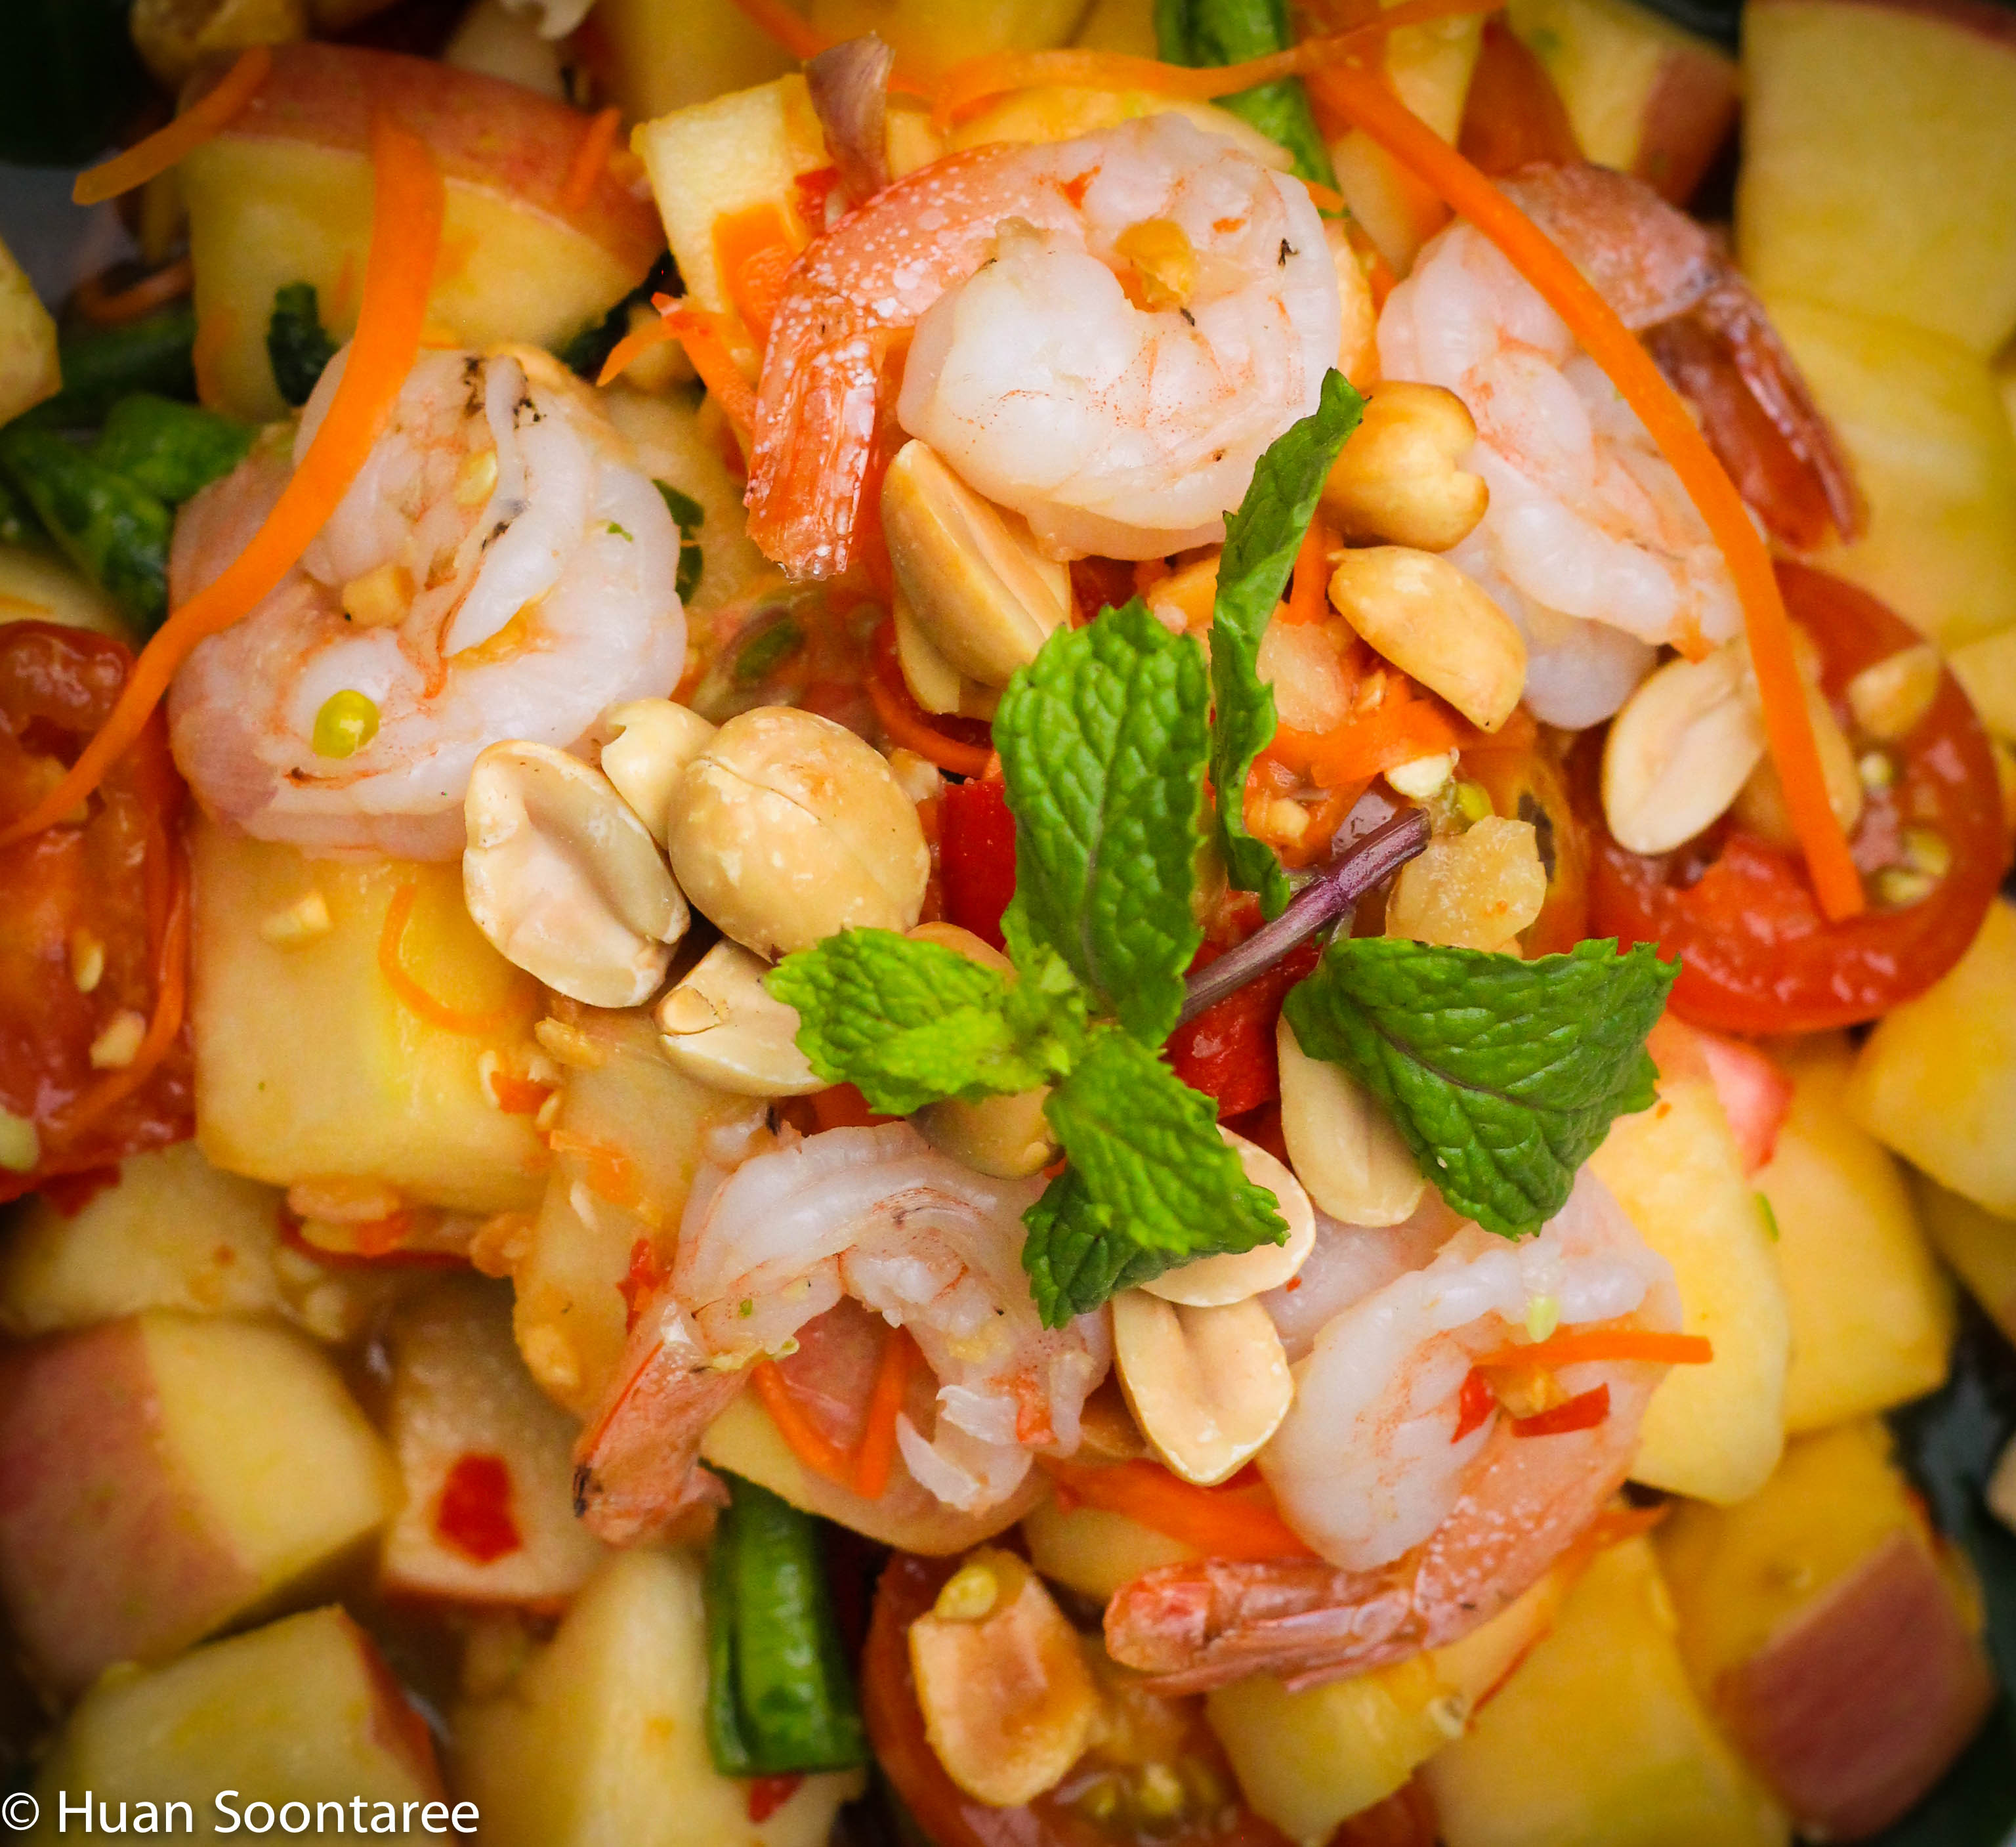 07 Apple and prawn salad